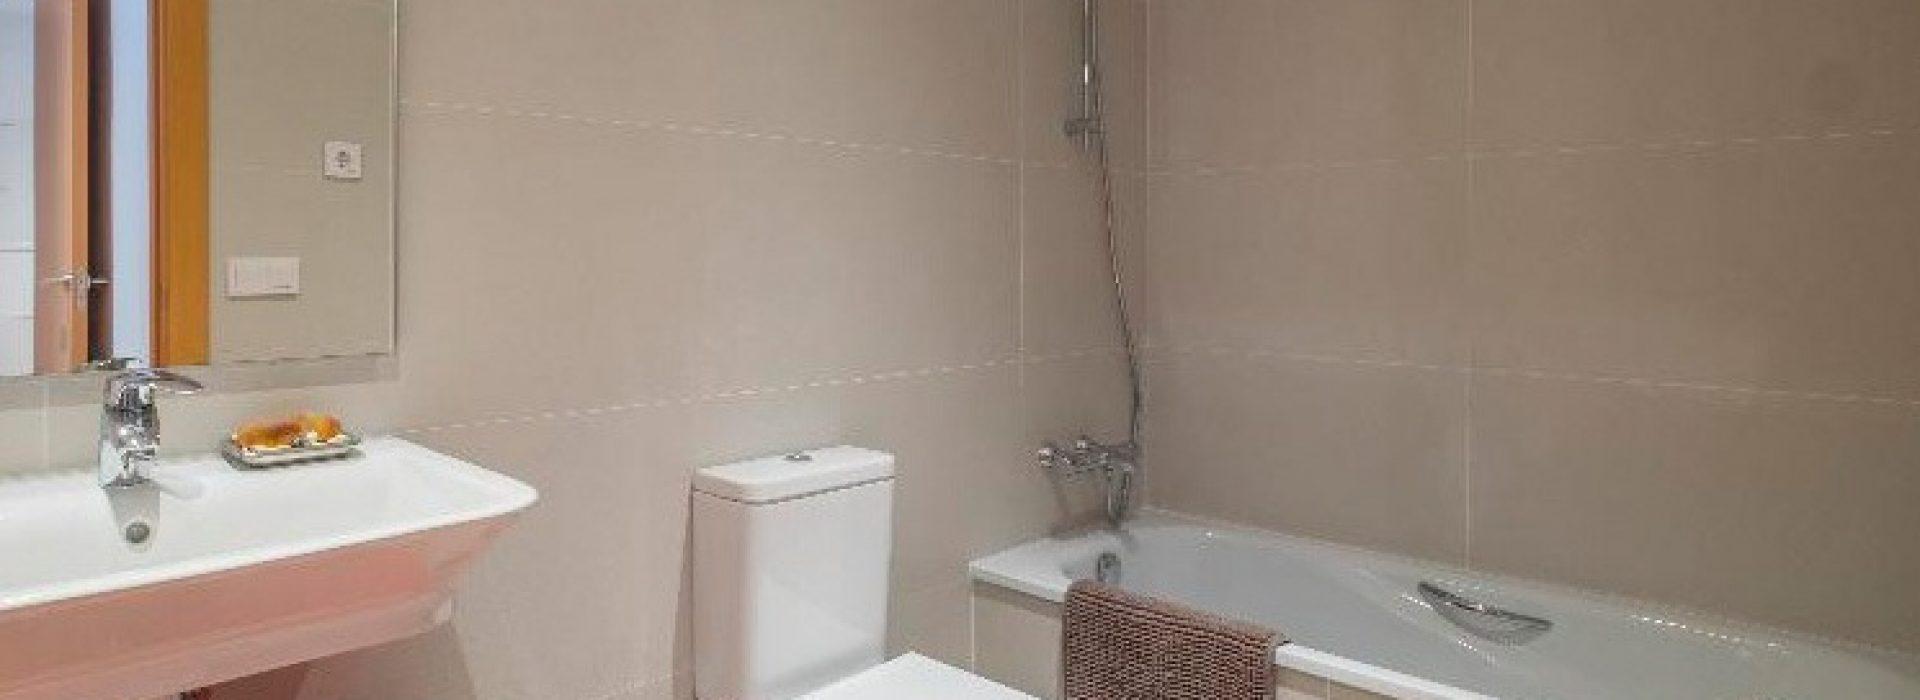 residencial-mas-marot04